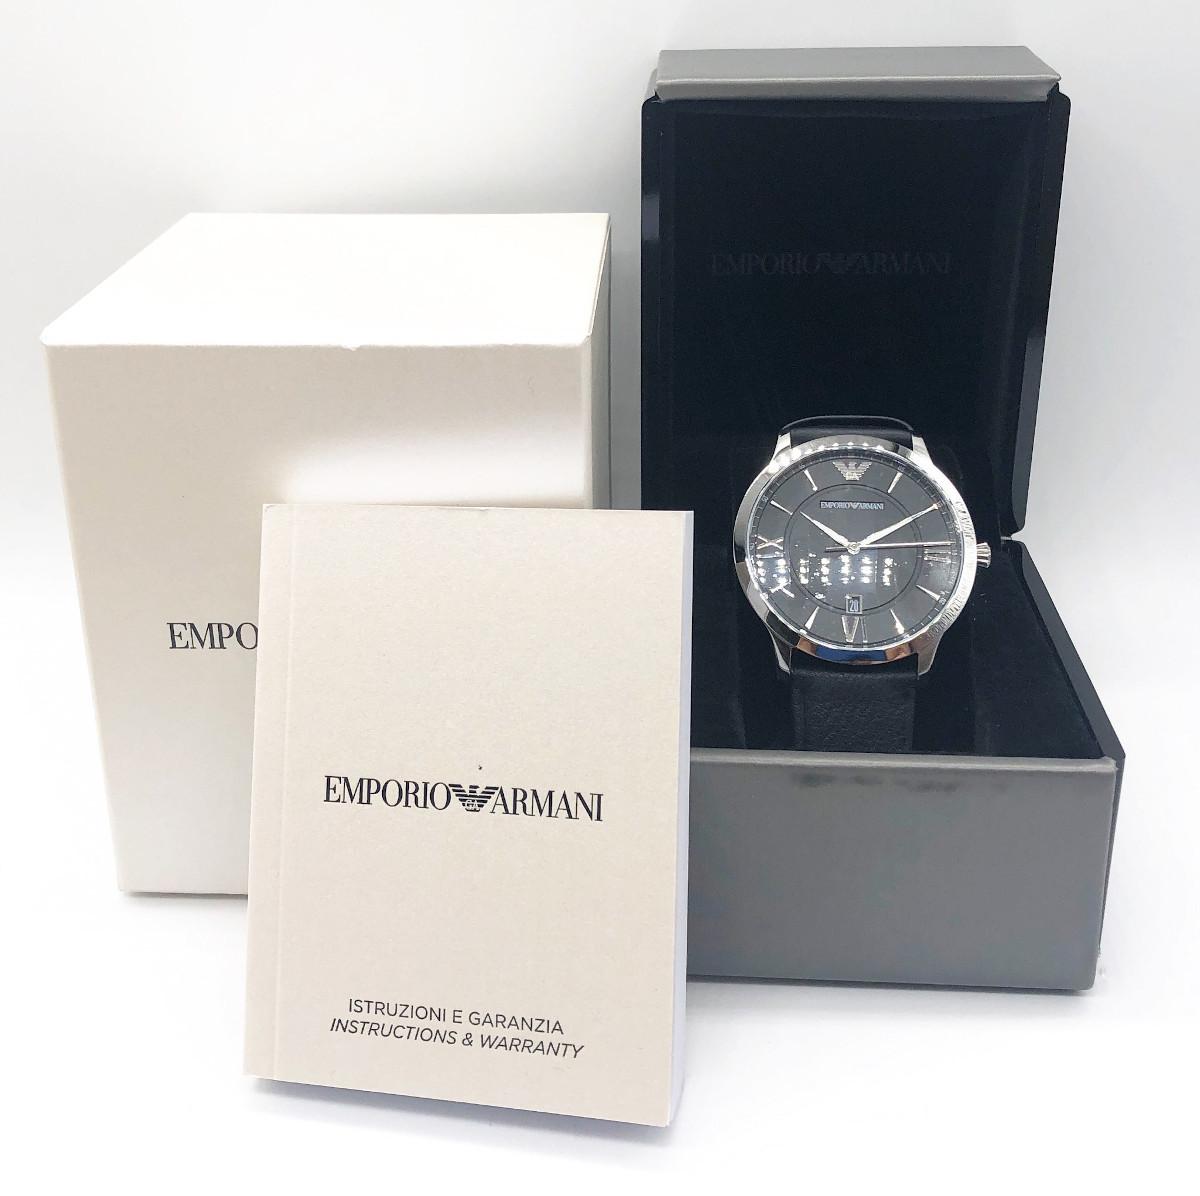 more photos 929a6 4f757 アルマーニ メンズ 時計 革ベルトの値段と価格推移は?|28件の ...